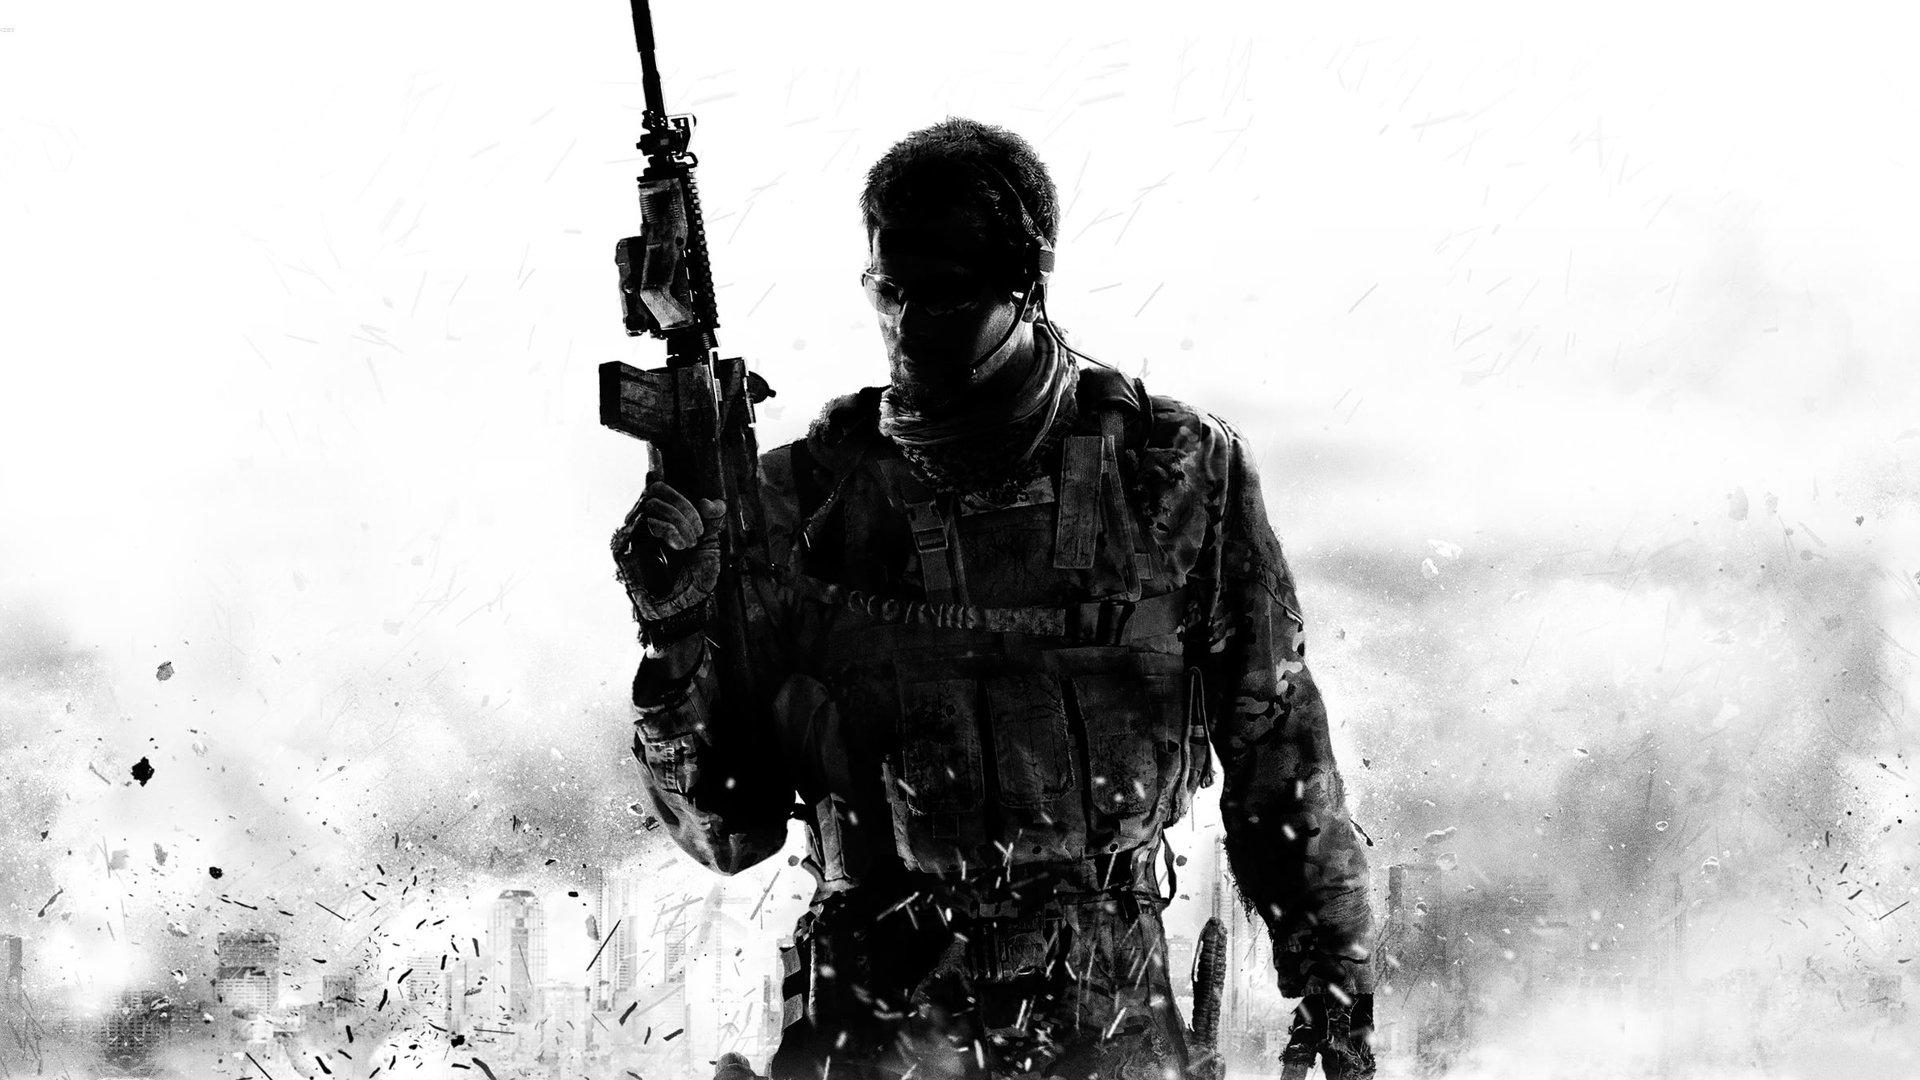 26 Call Of Duty Modern Warfare 3 HD Wallpapers